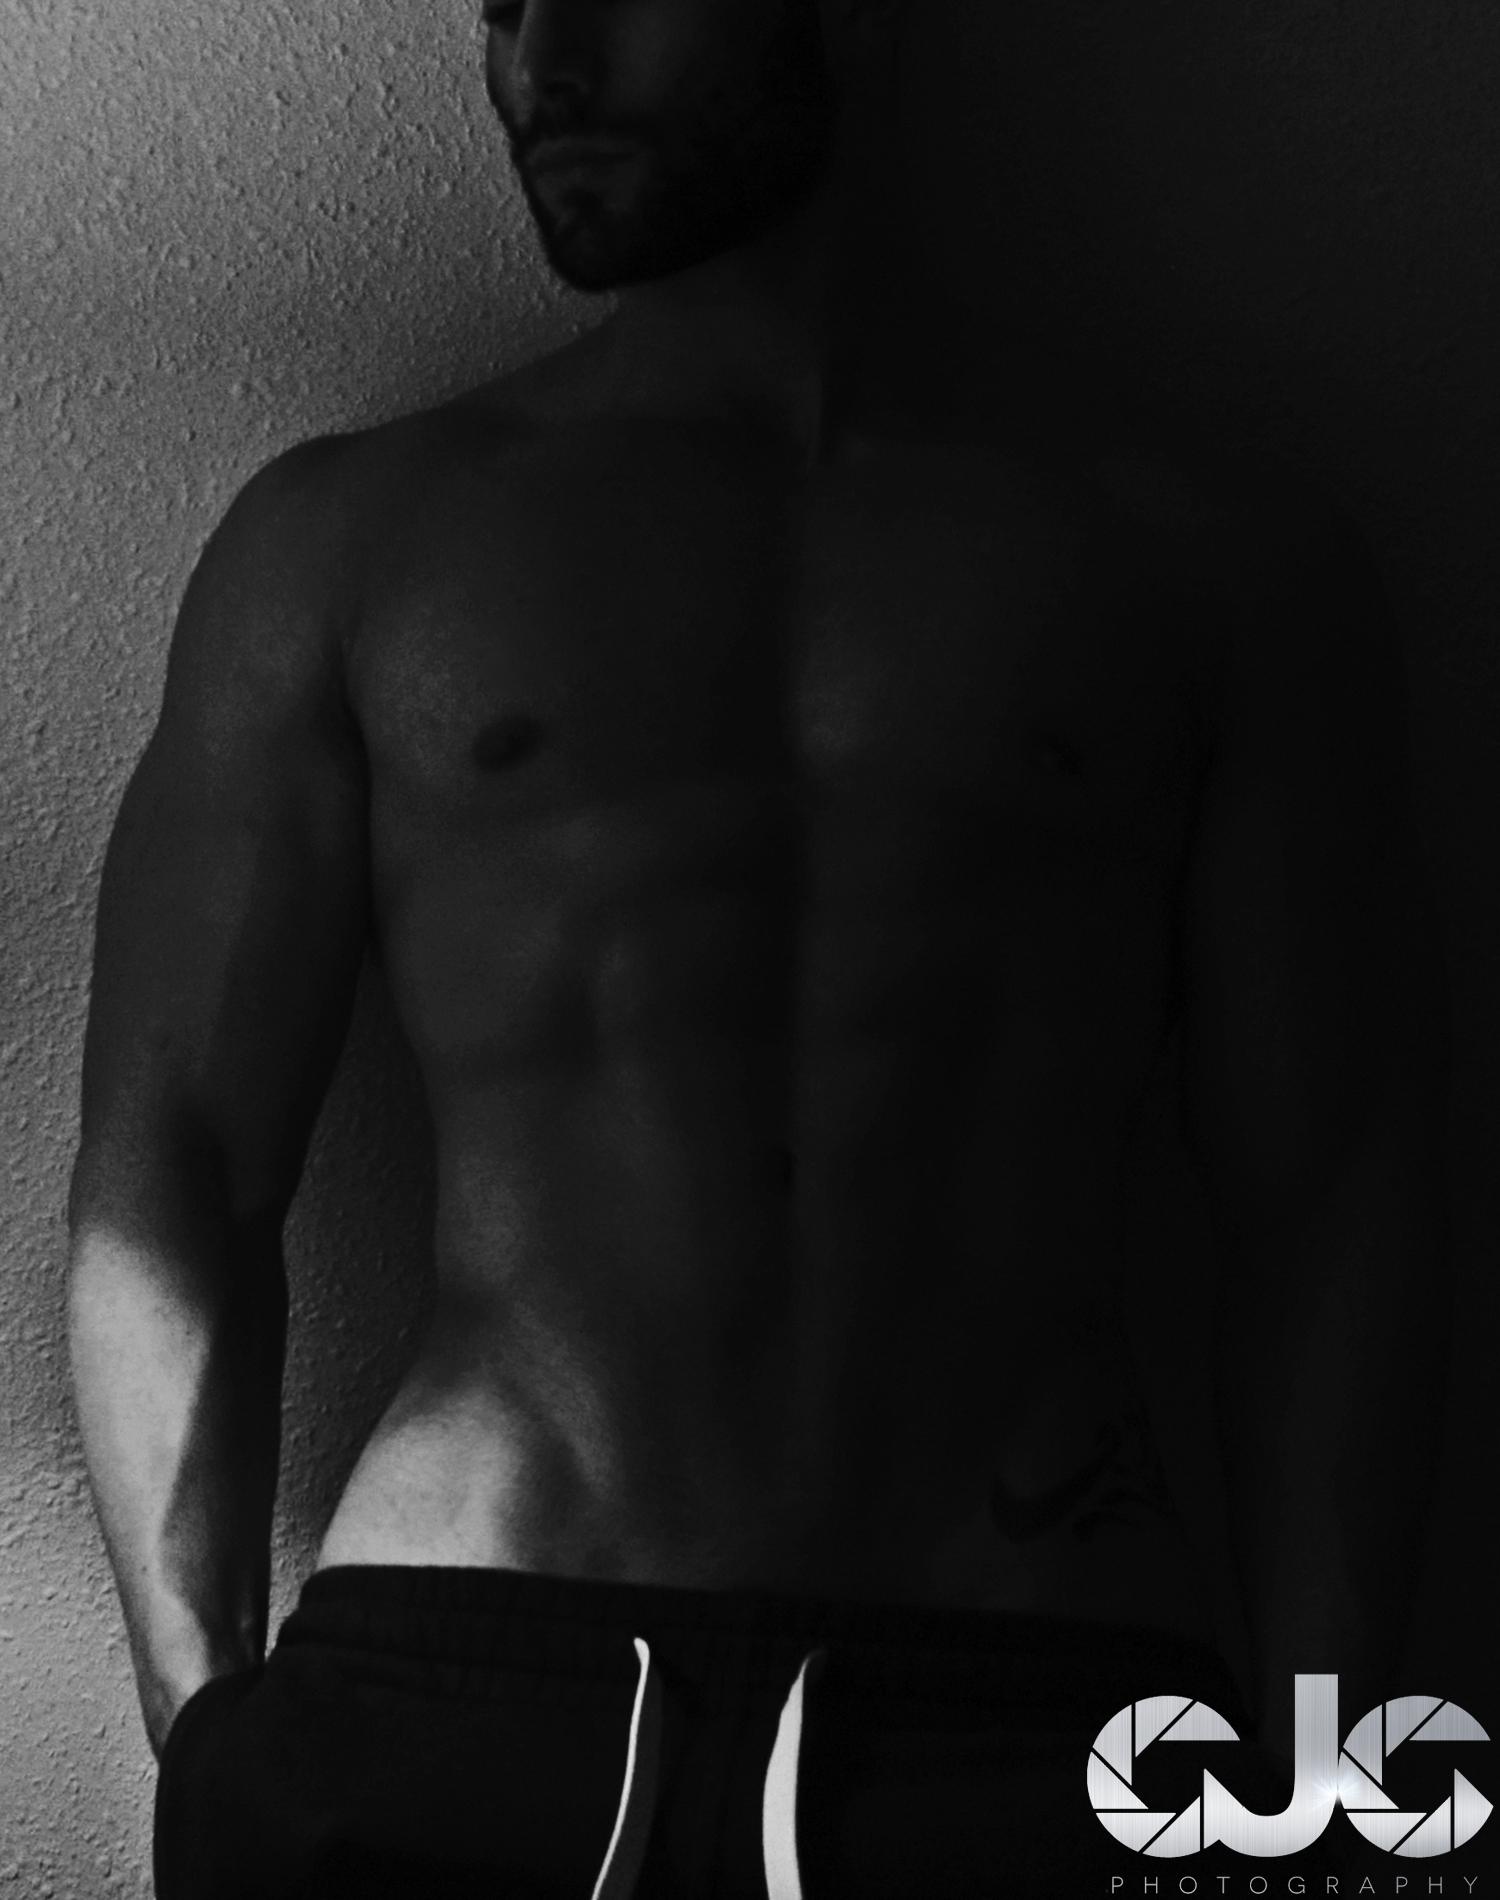 CJC Photography, Assad Shalhoub, Assad Shalhoub modeling and fitness, Assad Shalhoub fitness model, Boston photographer, book cover photographer, romance book cover photographer